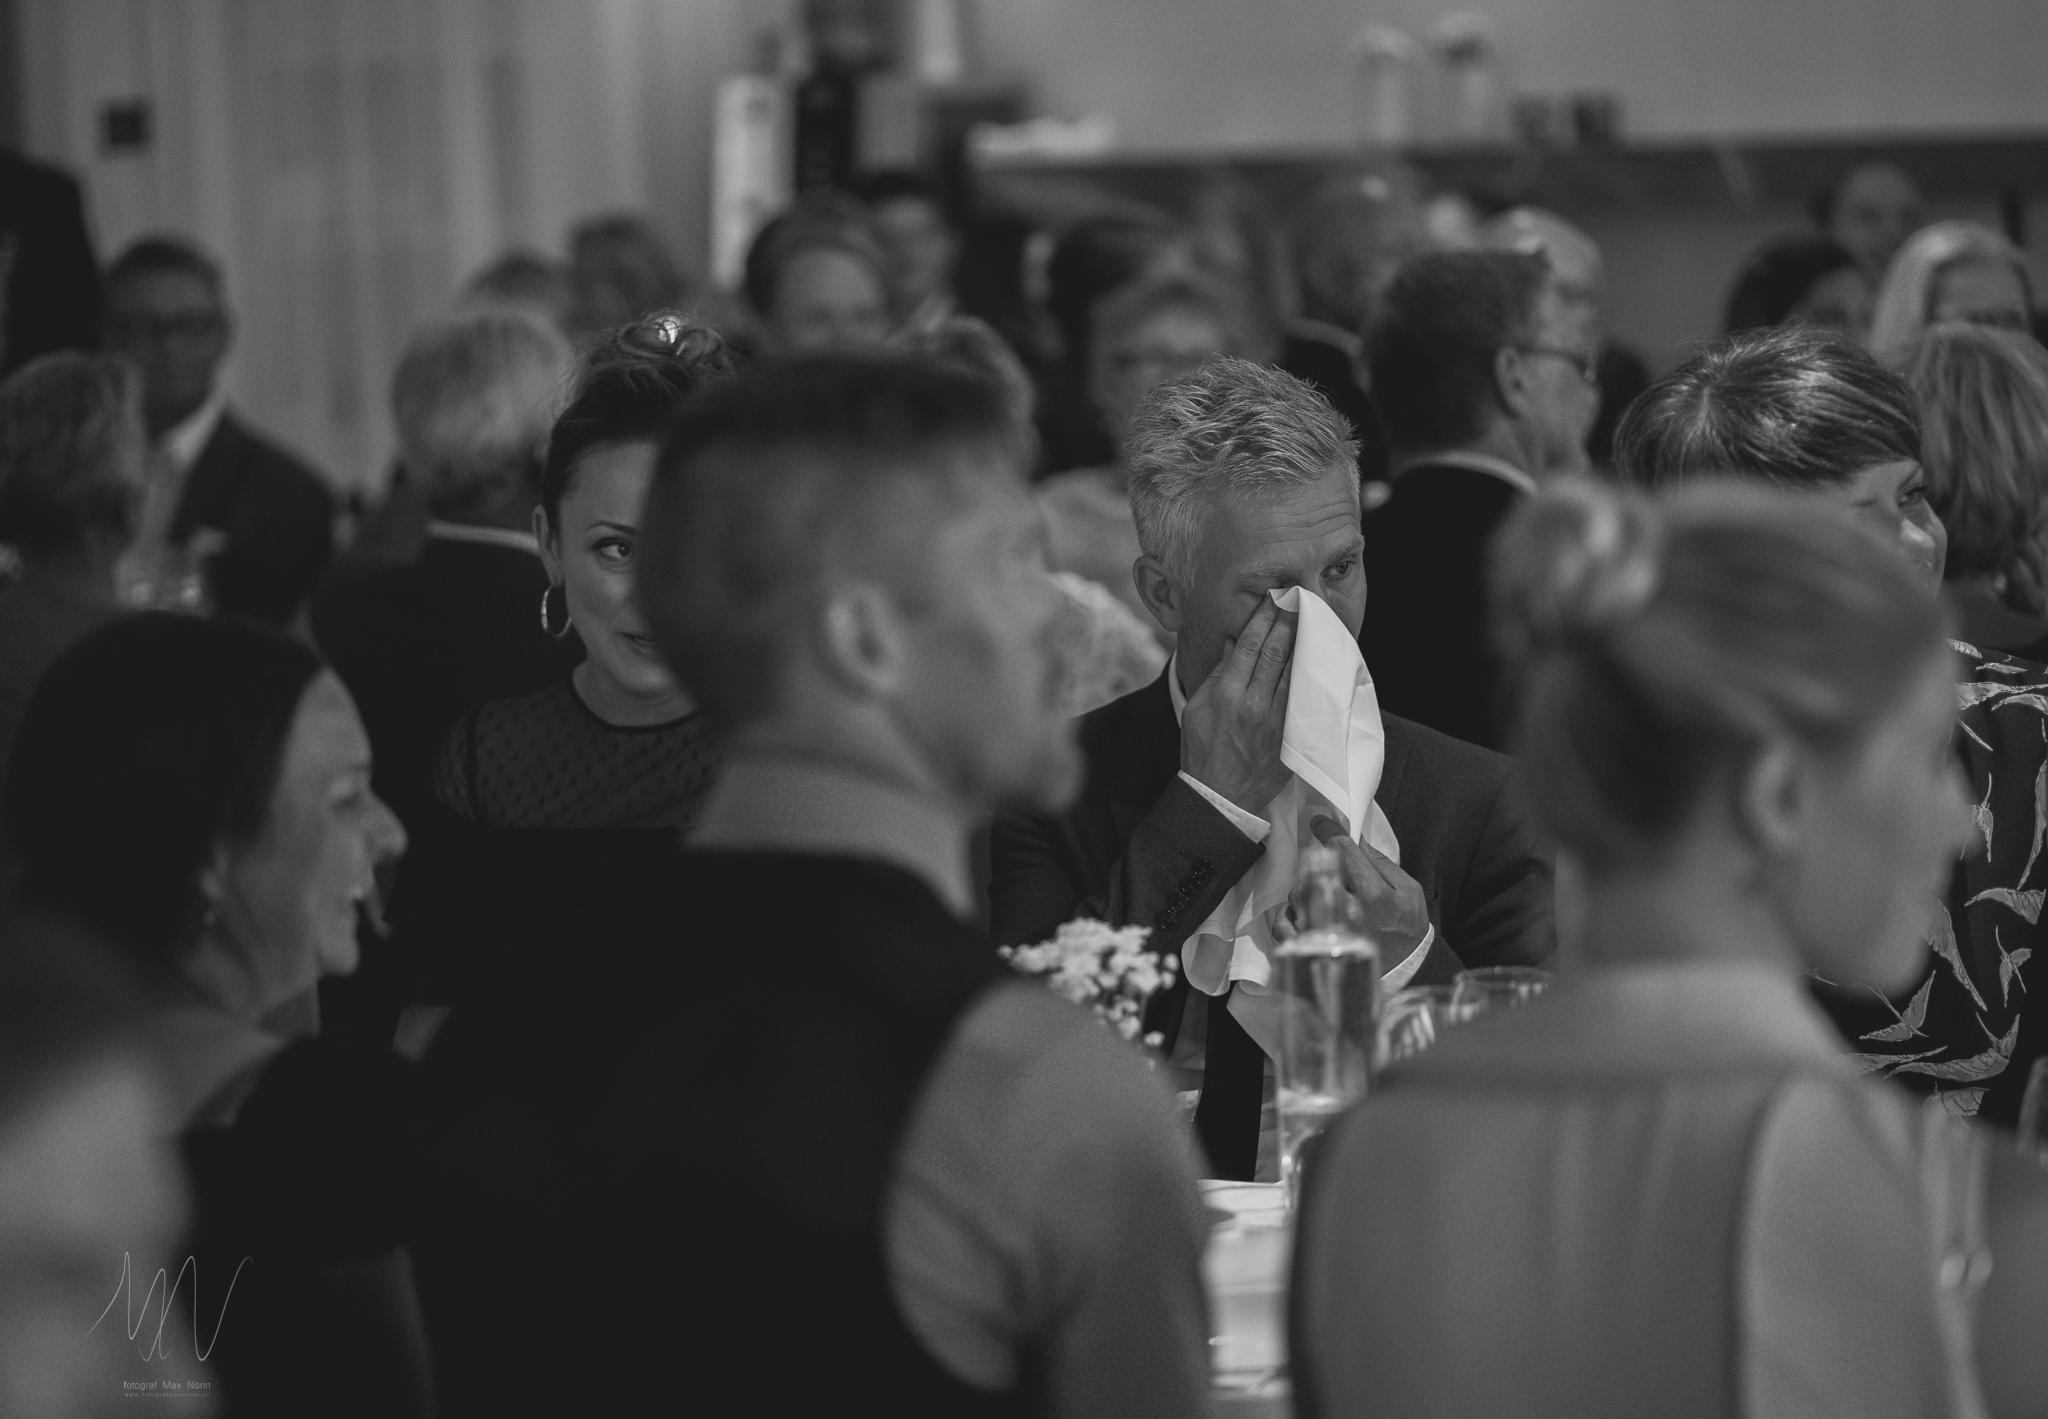 Bröllop-fotografmaxnorin.se-MariaMarcus-472.JPG